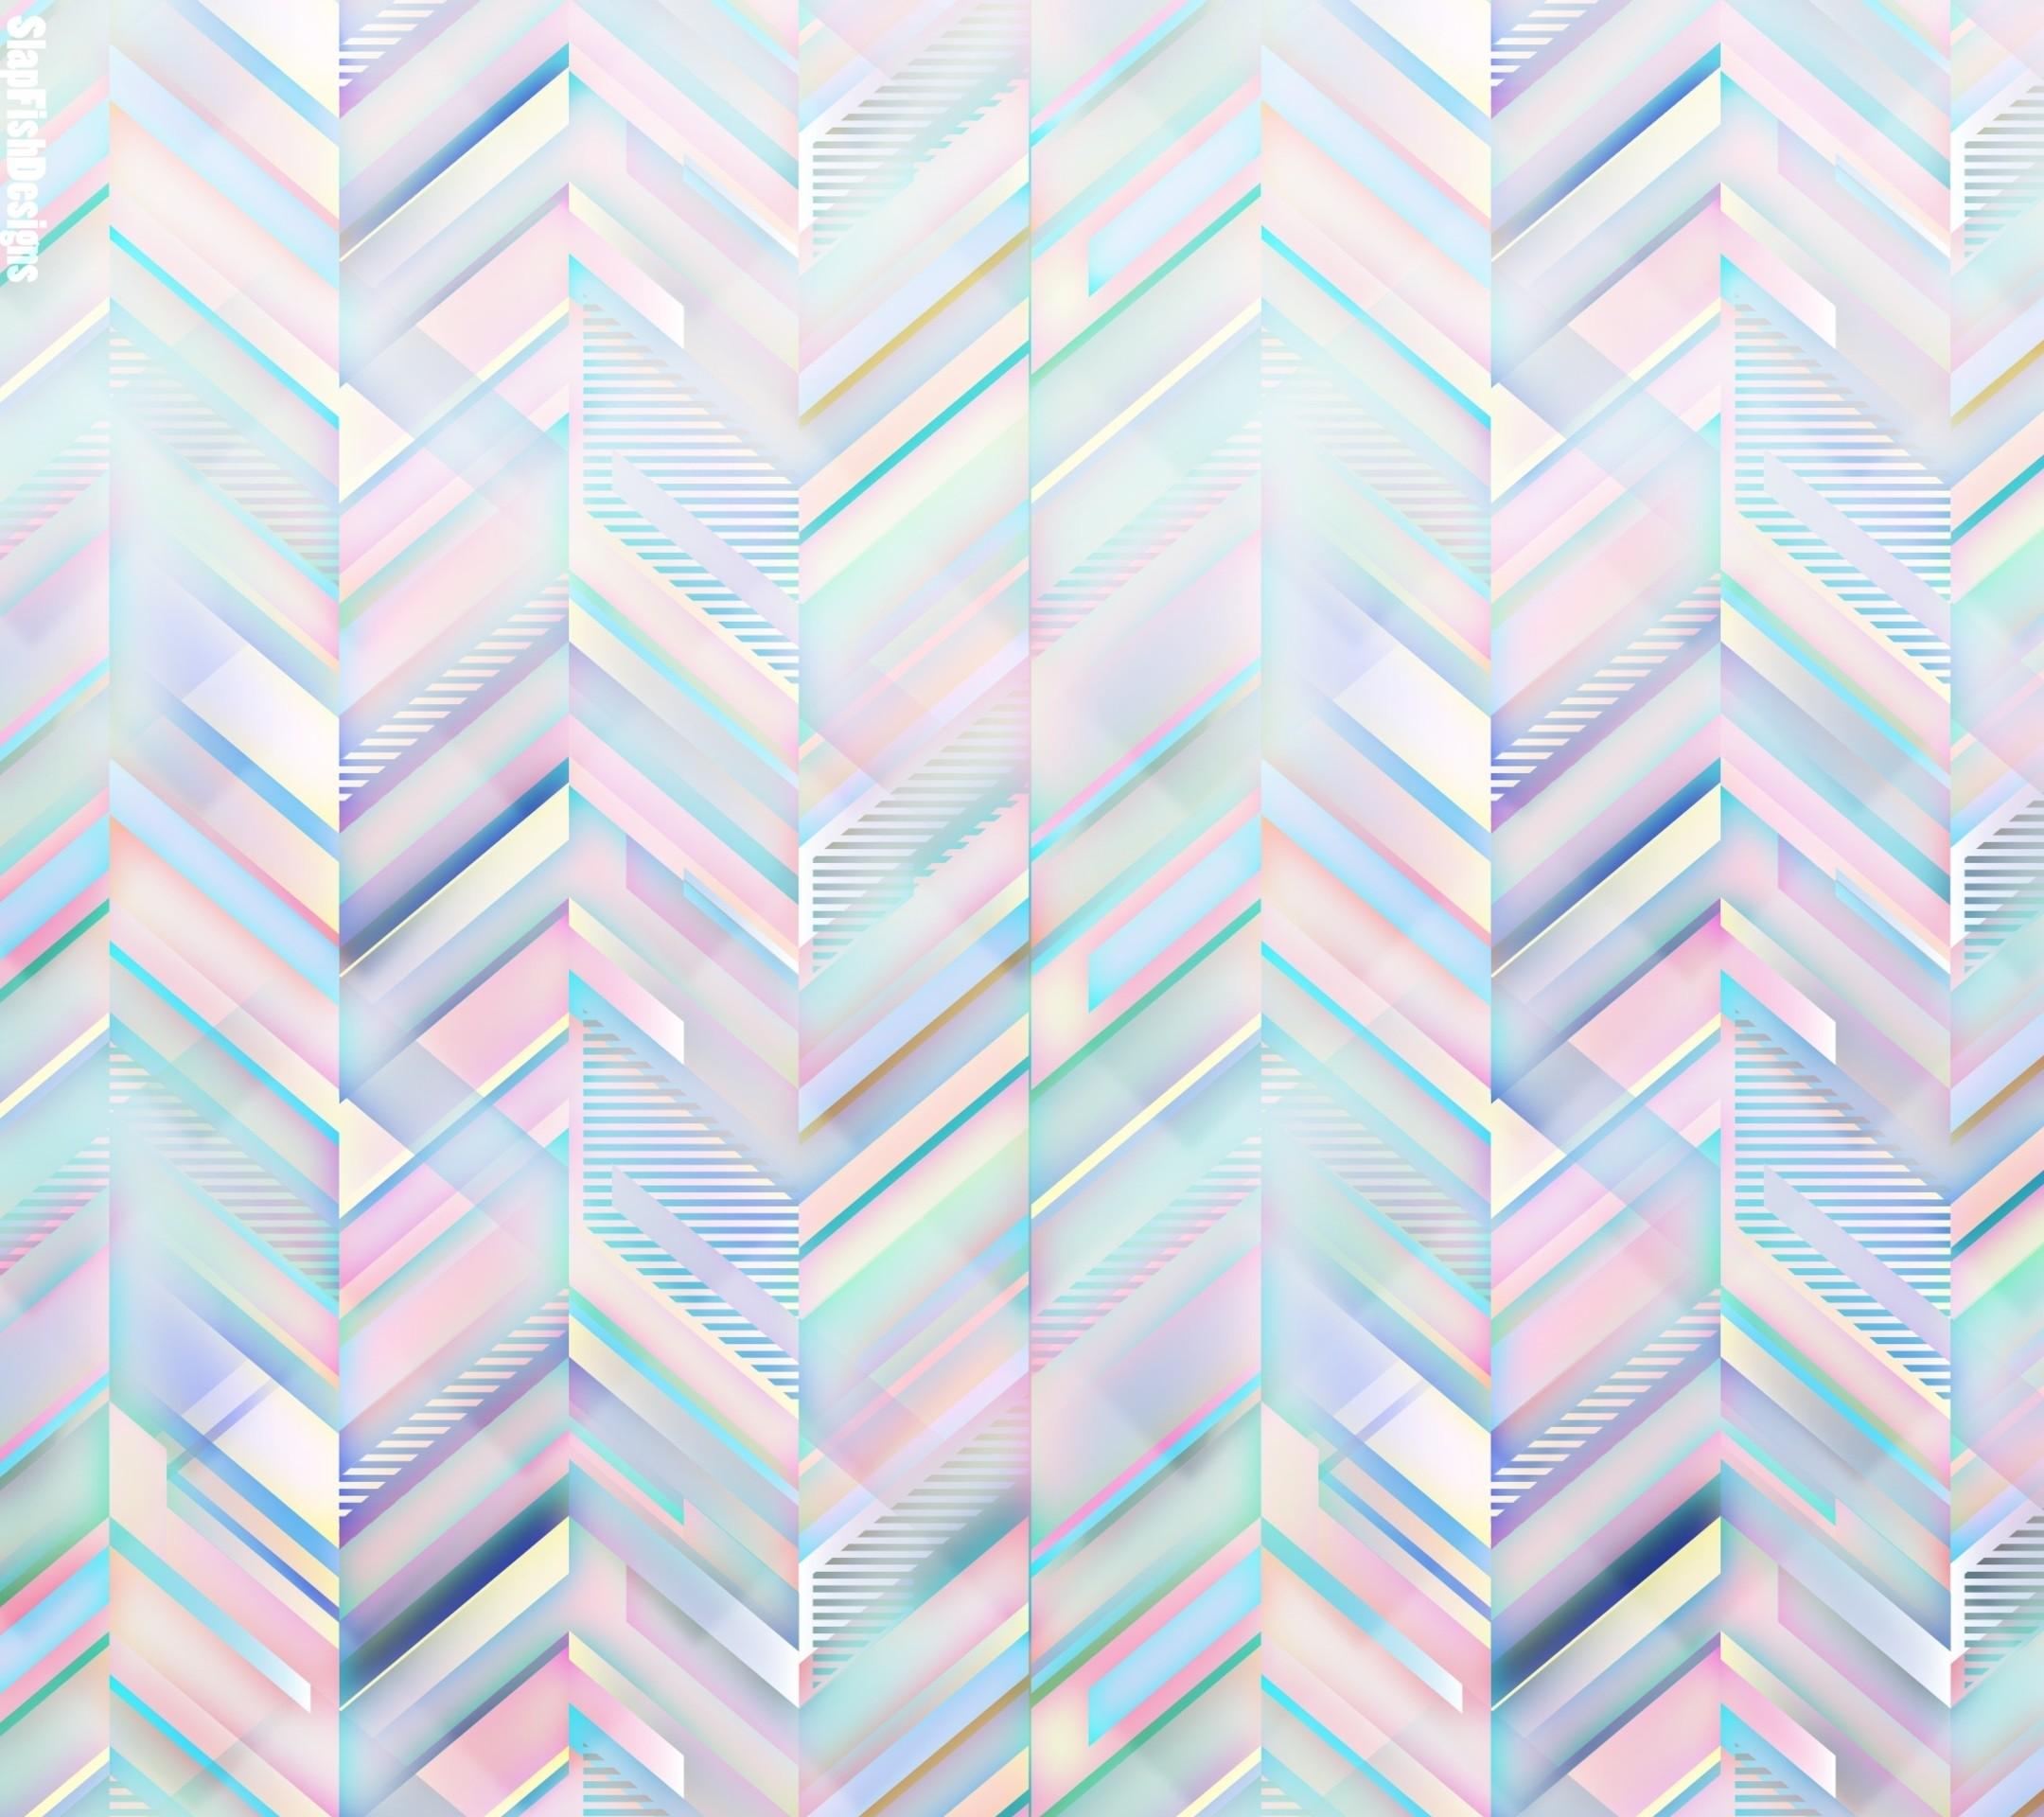 wallpaper tumblr patterns | Pattern Wallpapers Tumblr -wallpaper-hd -patterns_79-